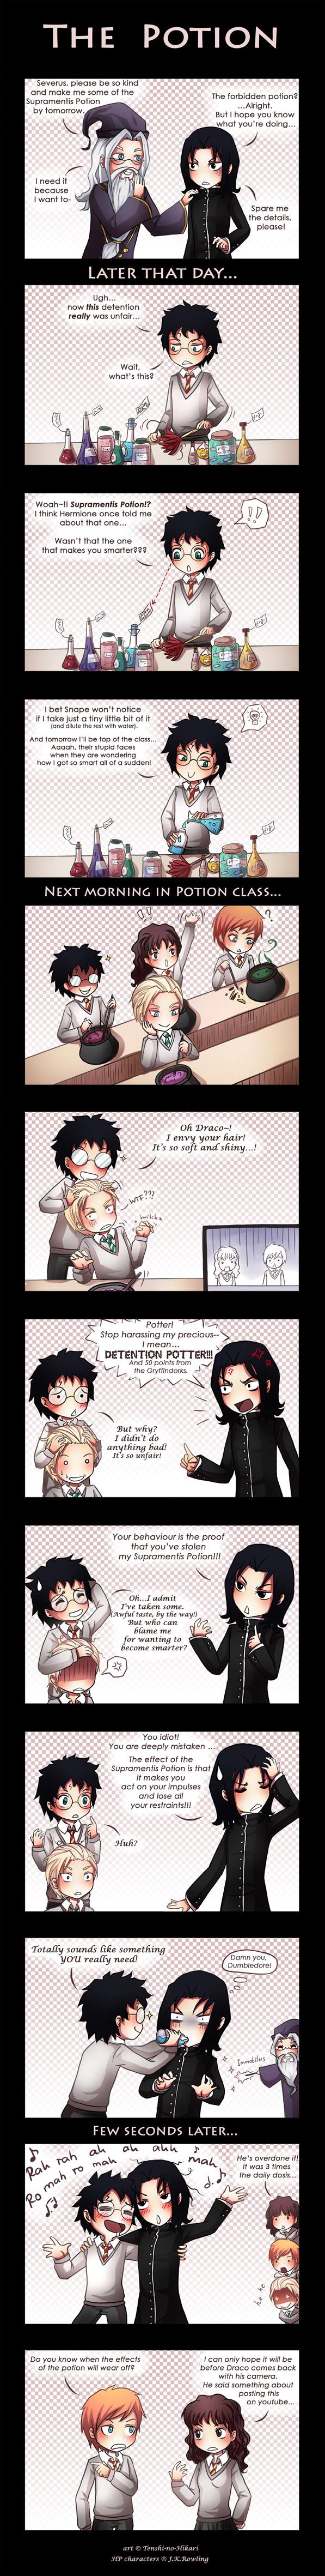 HP - The potion by Tenshi-no-Hikari